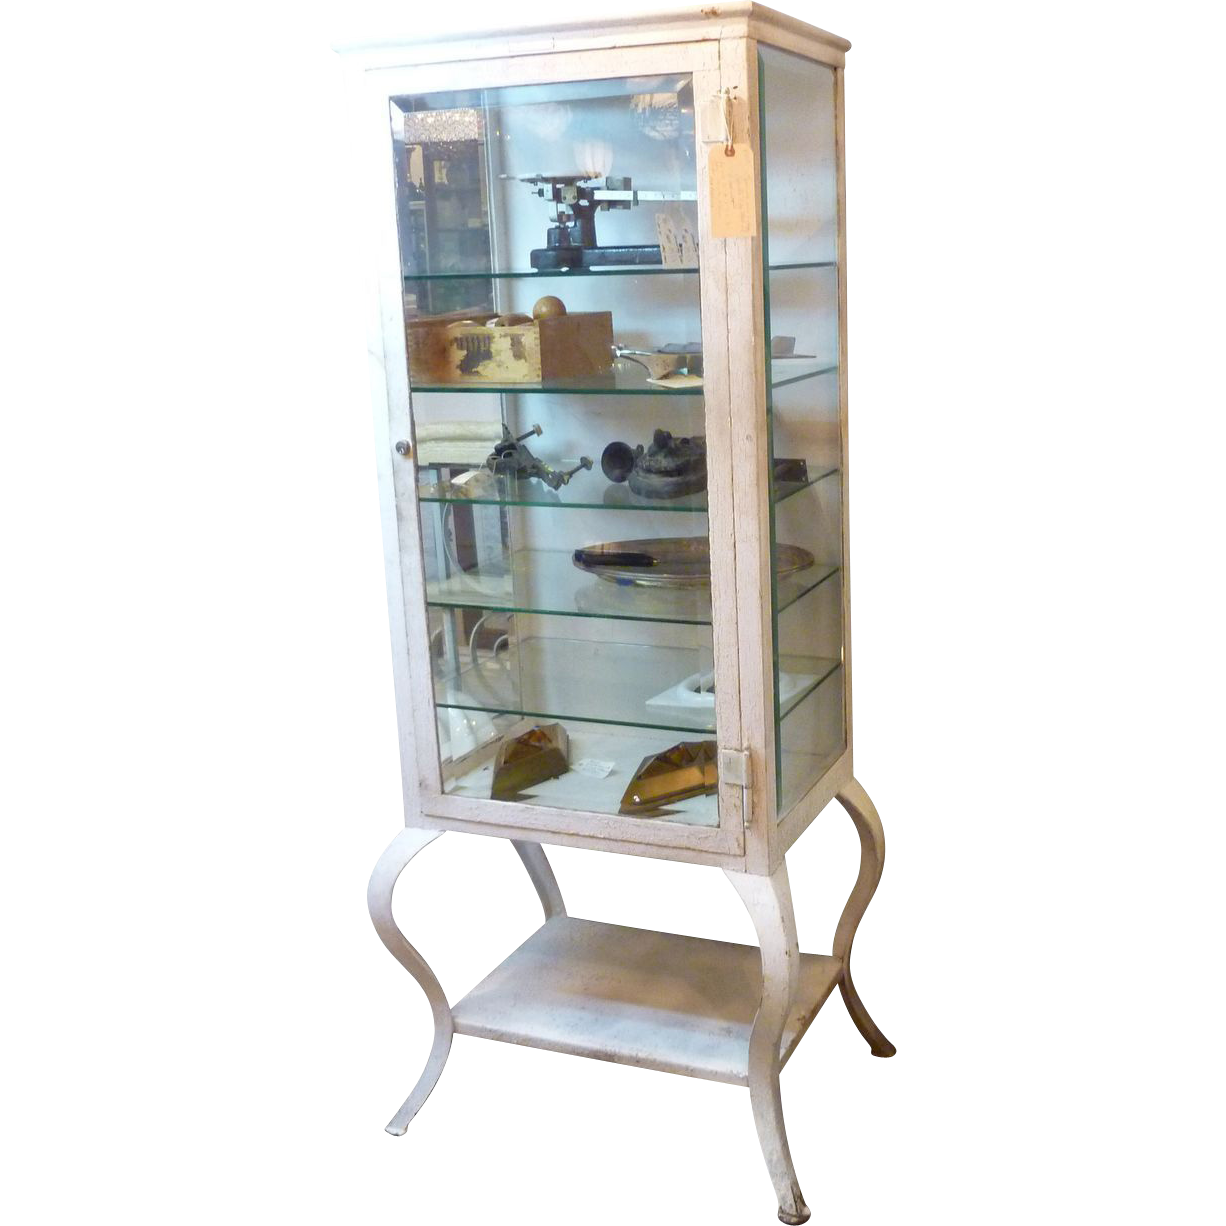 1920's Vintage medicine cabinet with cabriole legs and crackled white  paint. It includes glass shelves - Antique Doctors Medicine Cabinet Antique Furniture